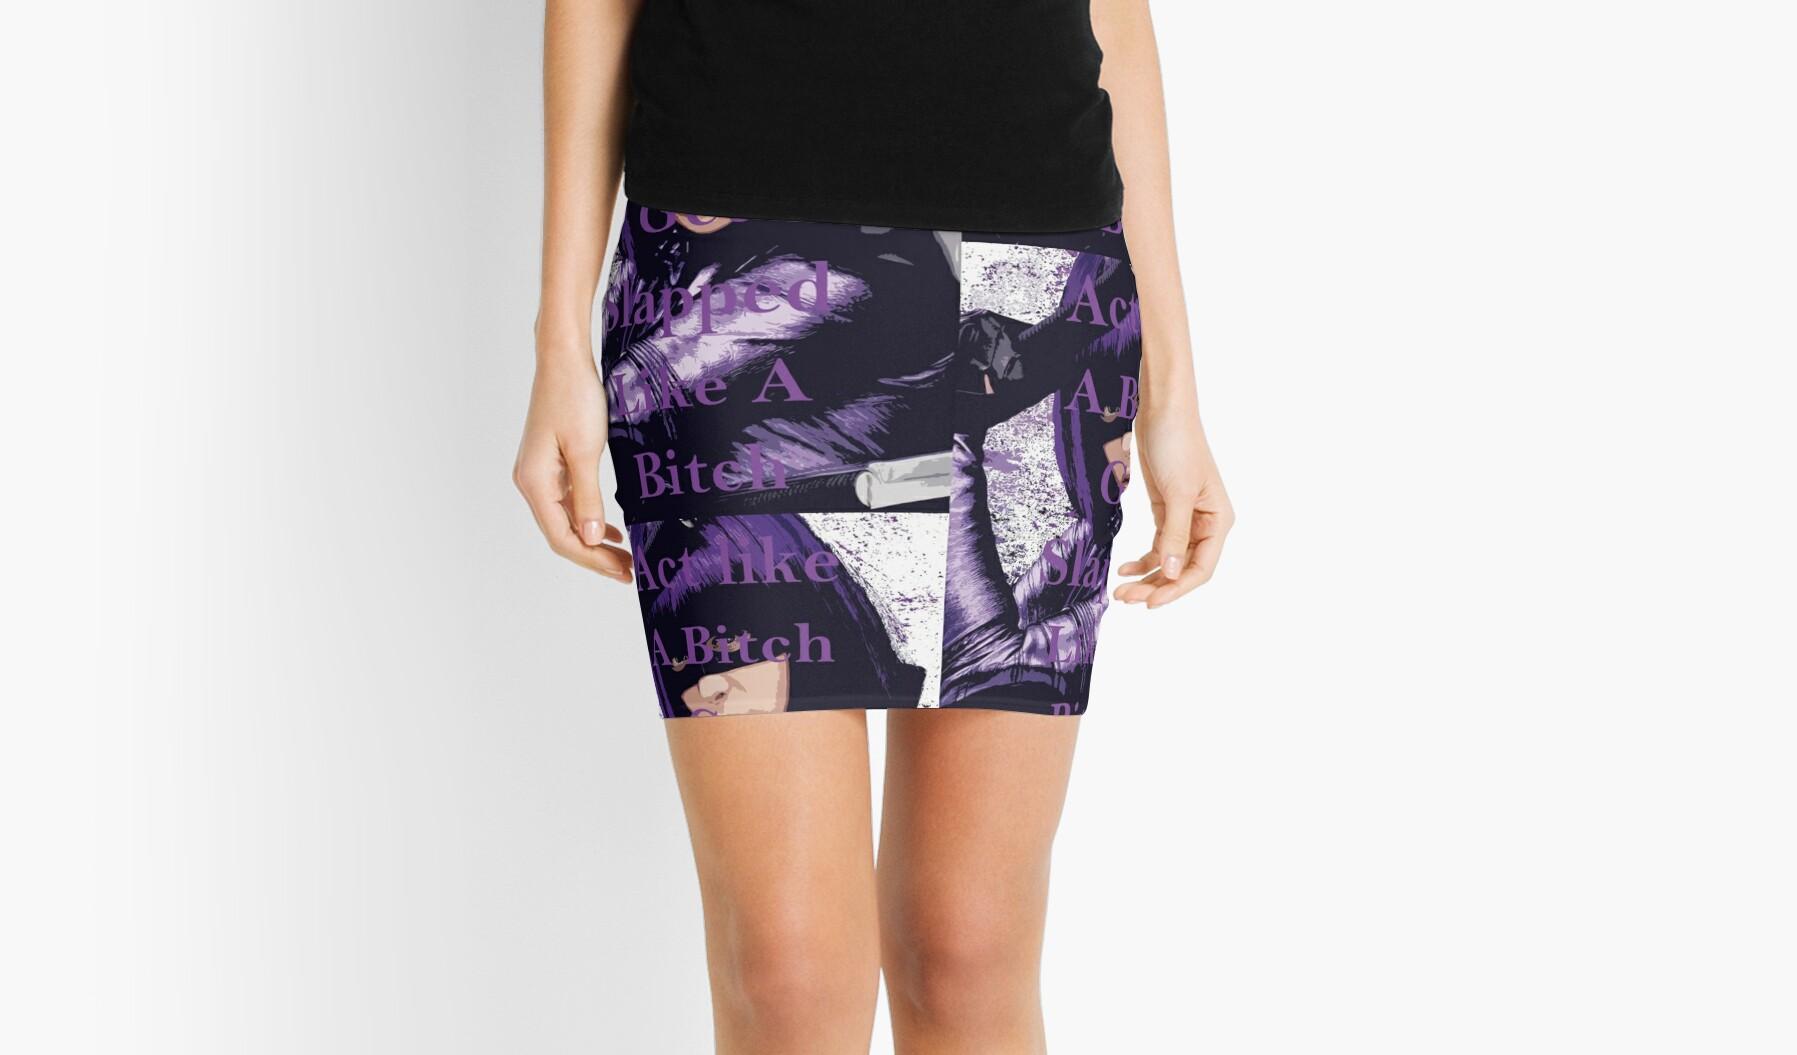 Ass in mini skirts